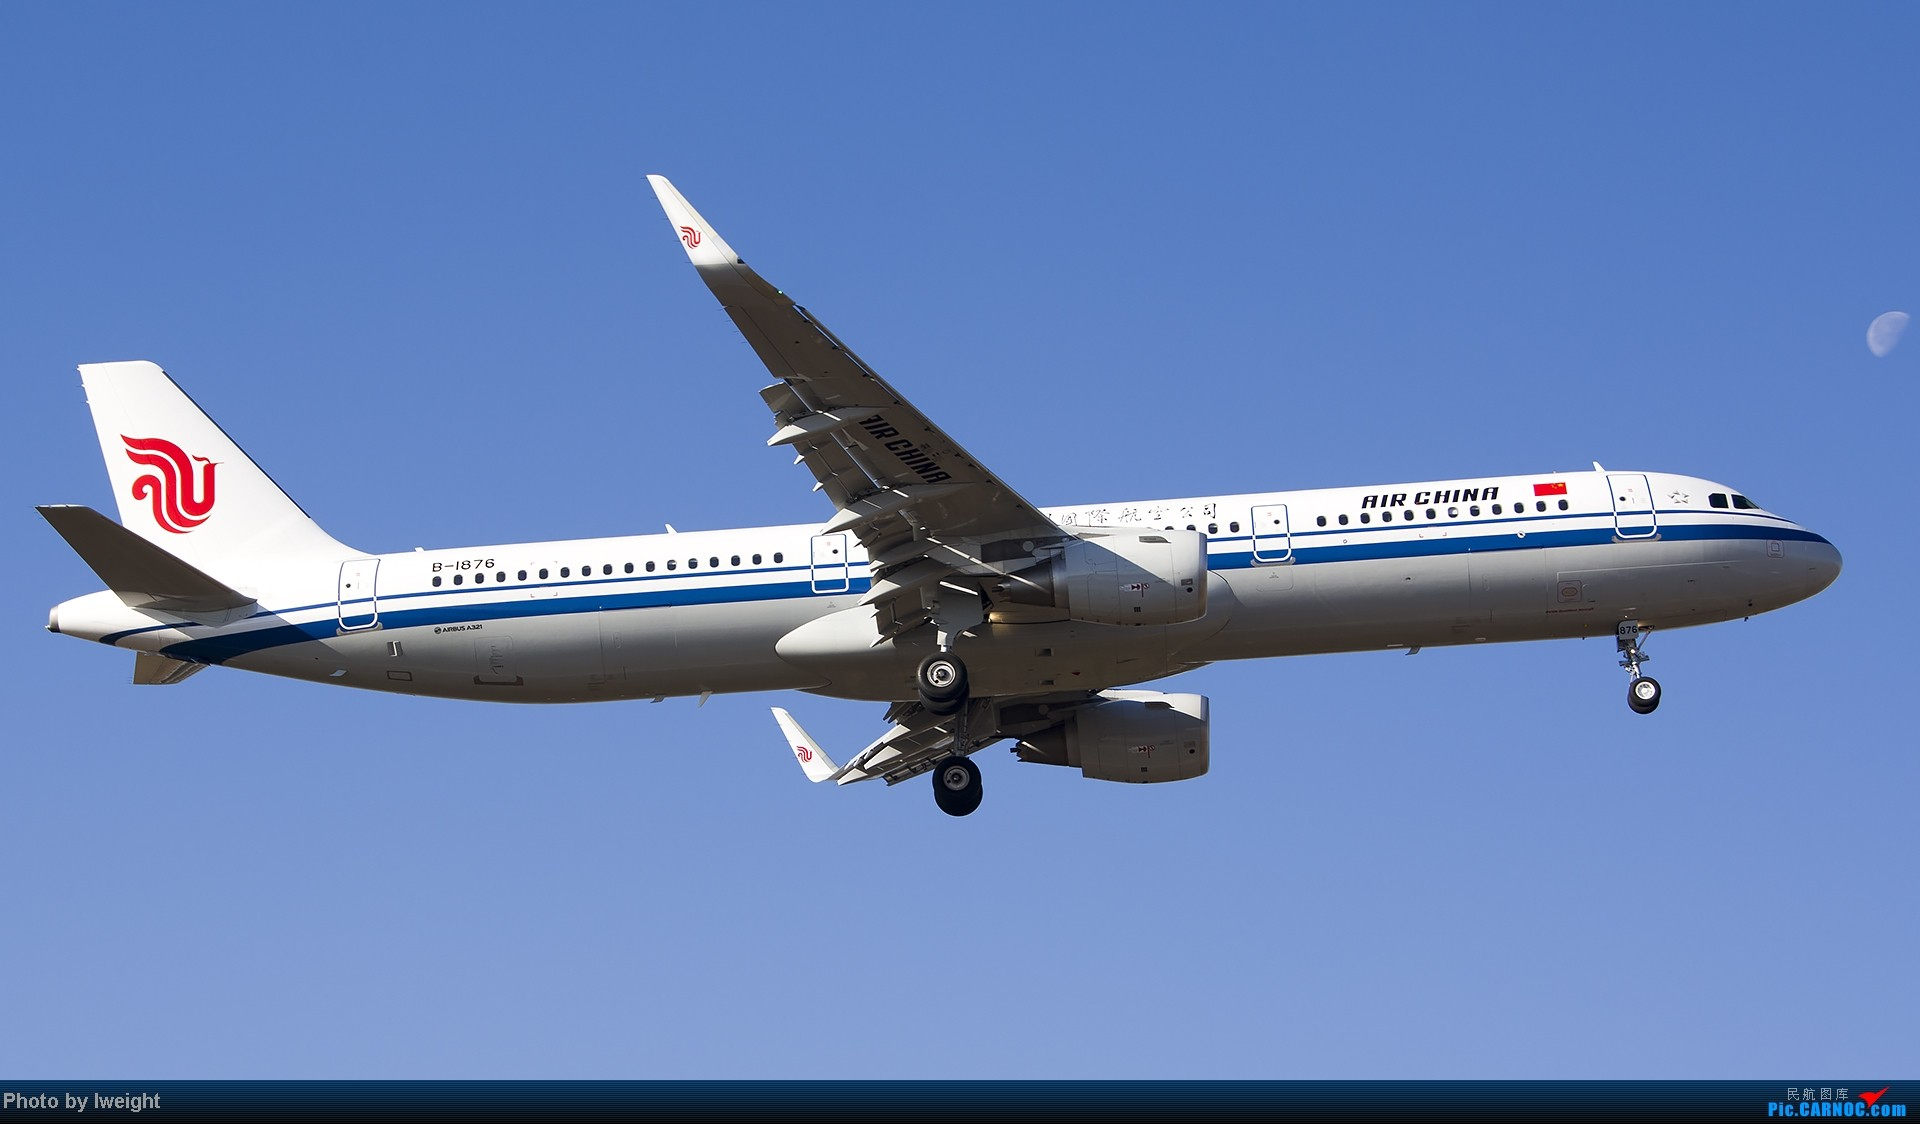 Re:[原创]抓住APEC蓝的尾巴,再拍上一组 AIRBUS A321-200 B-1876 中国北京首都机场